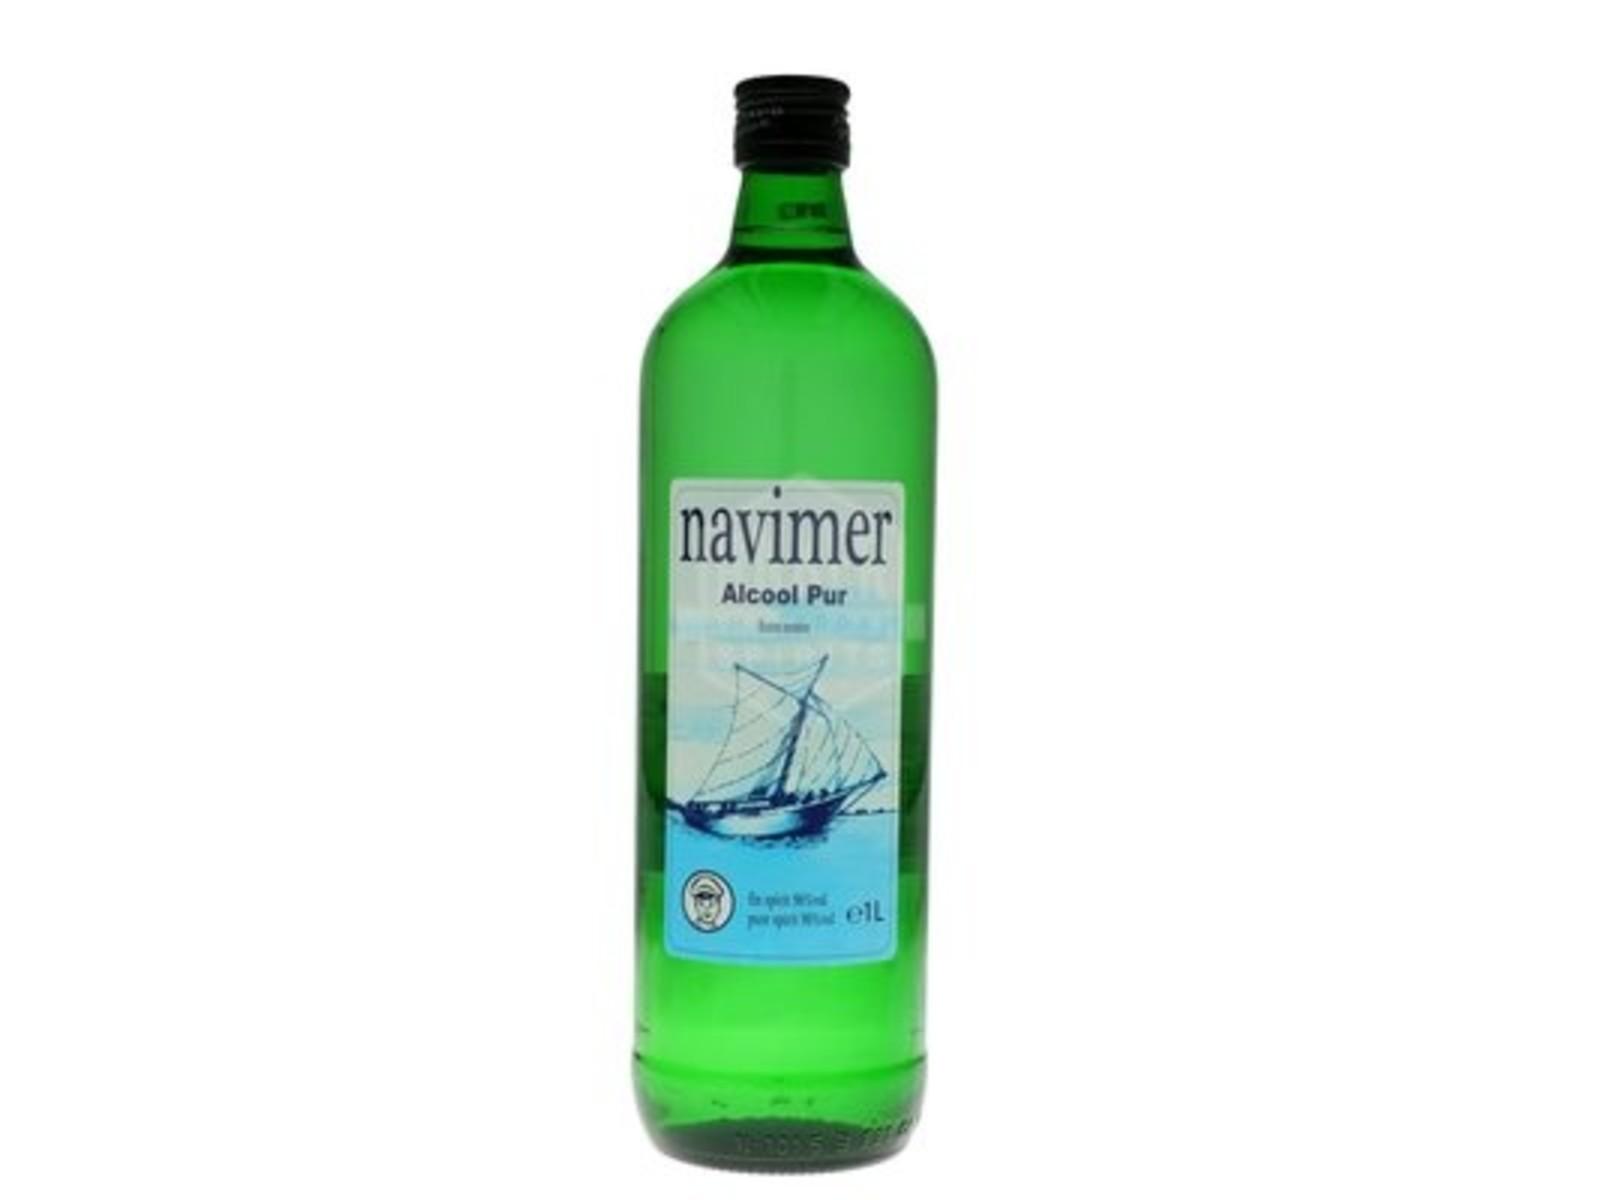 Navimer Navimer Alcohol Pur Glas